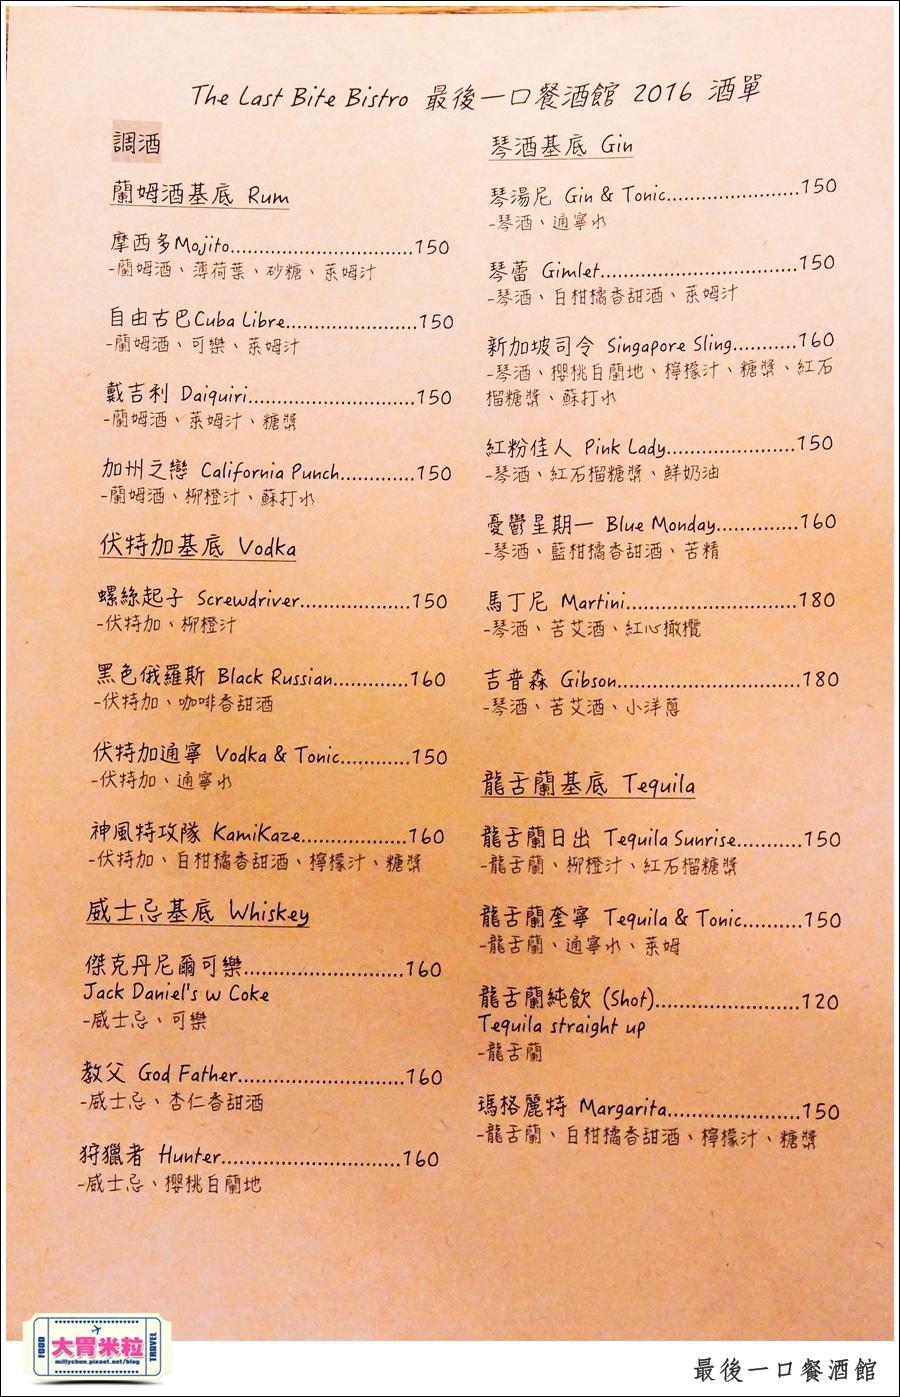 The Last Bite Bistro 最後一口餐酒館@高雄餐酒館推薦@大胃米粒0018.jpg